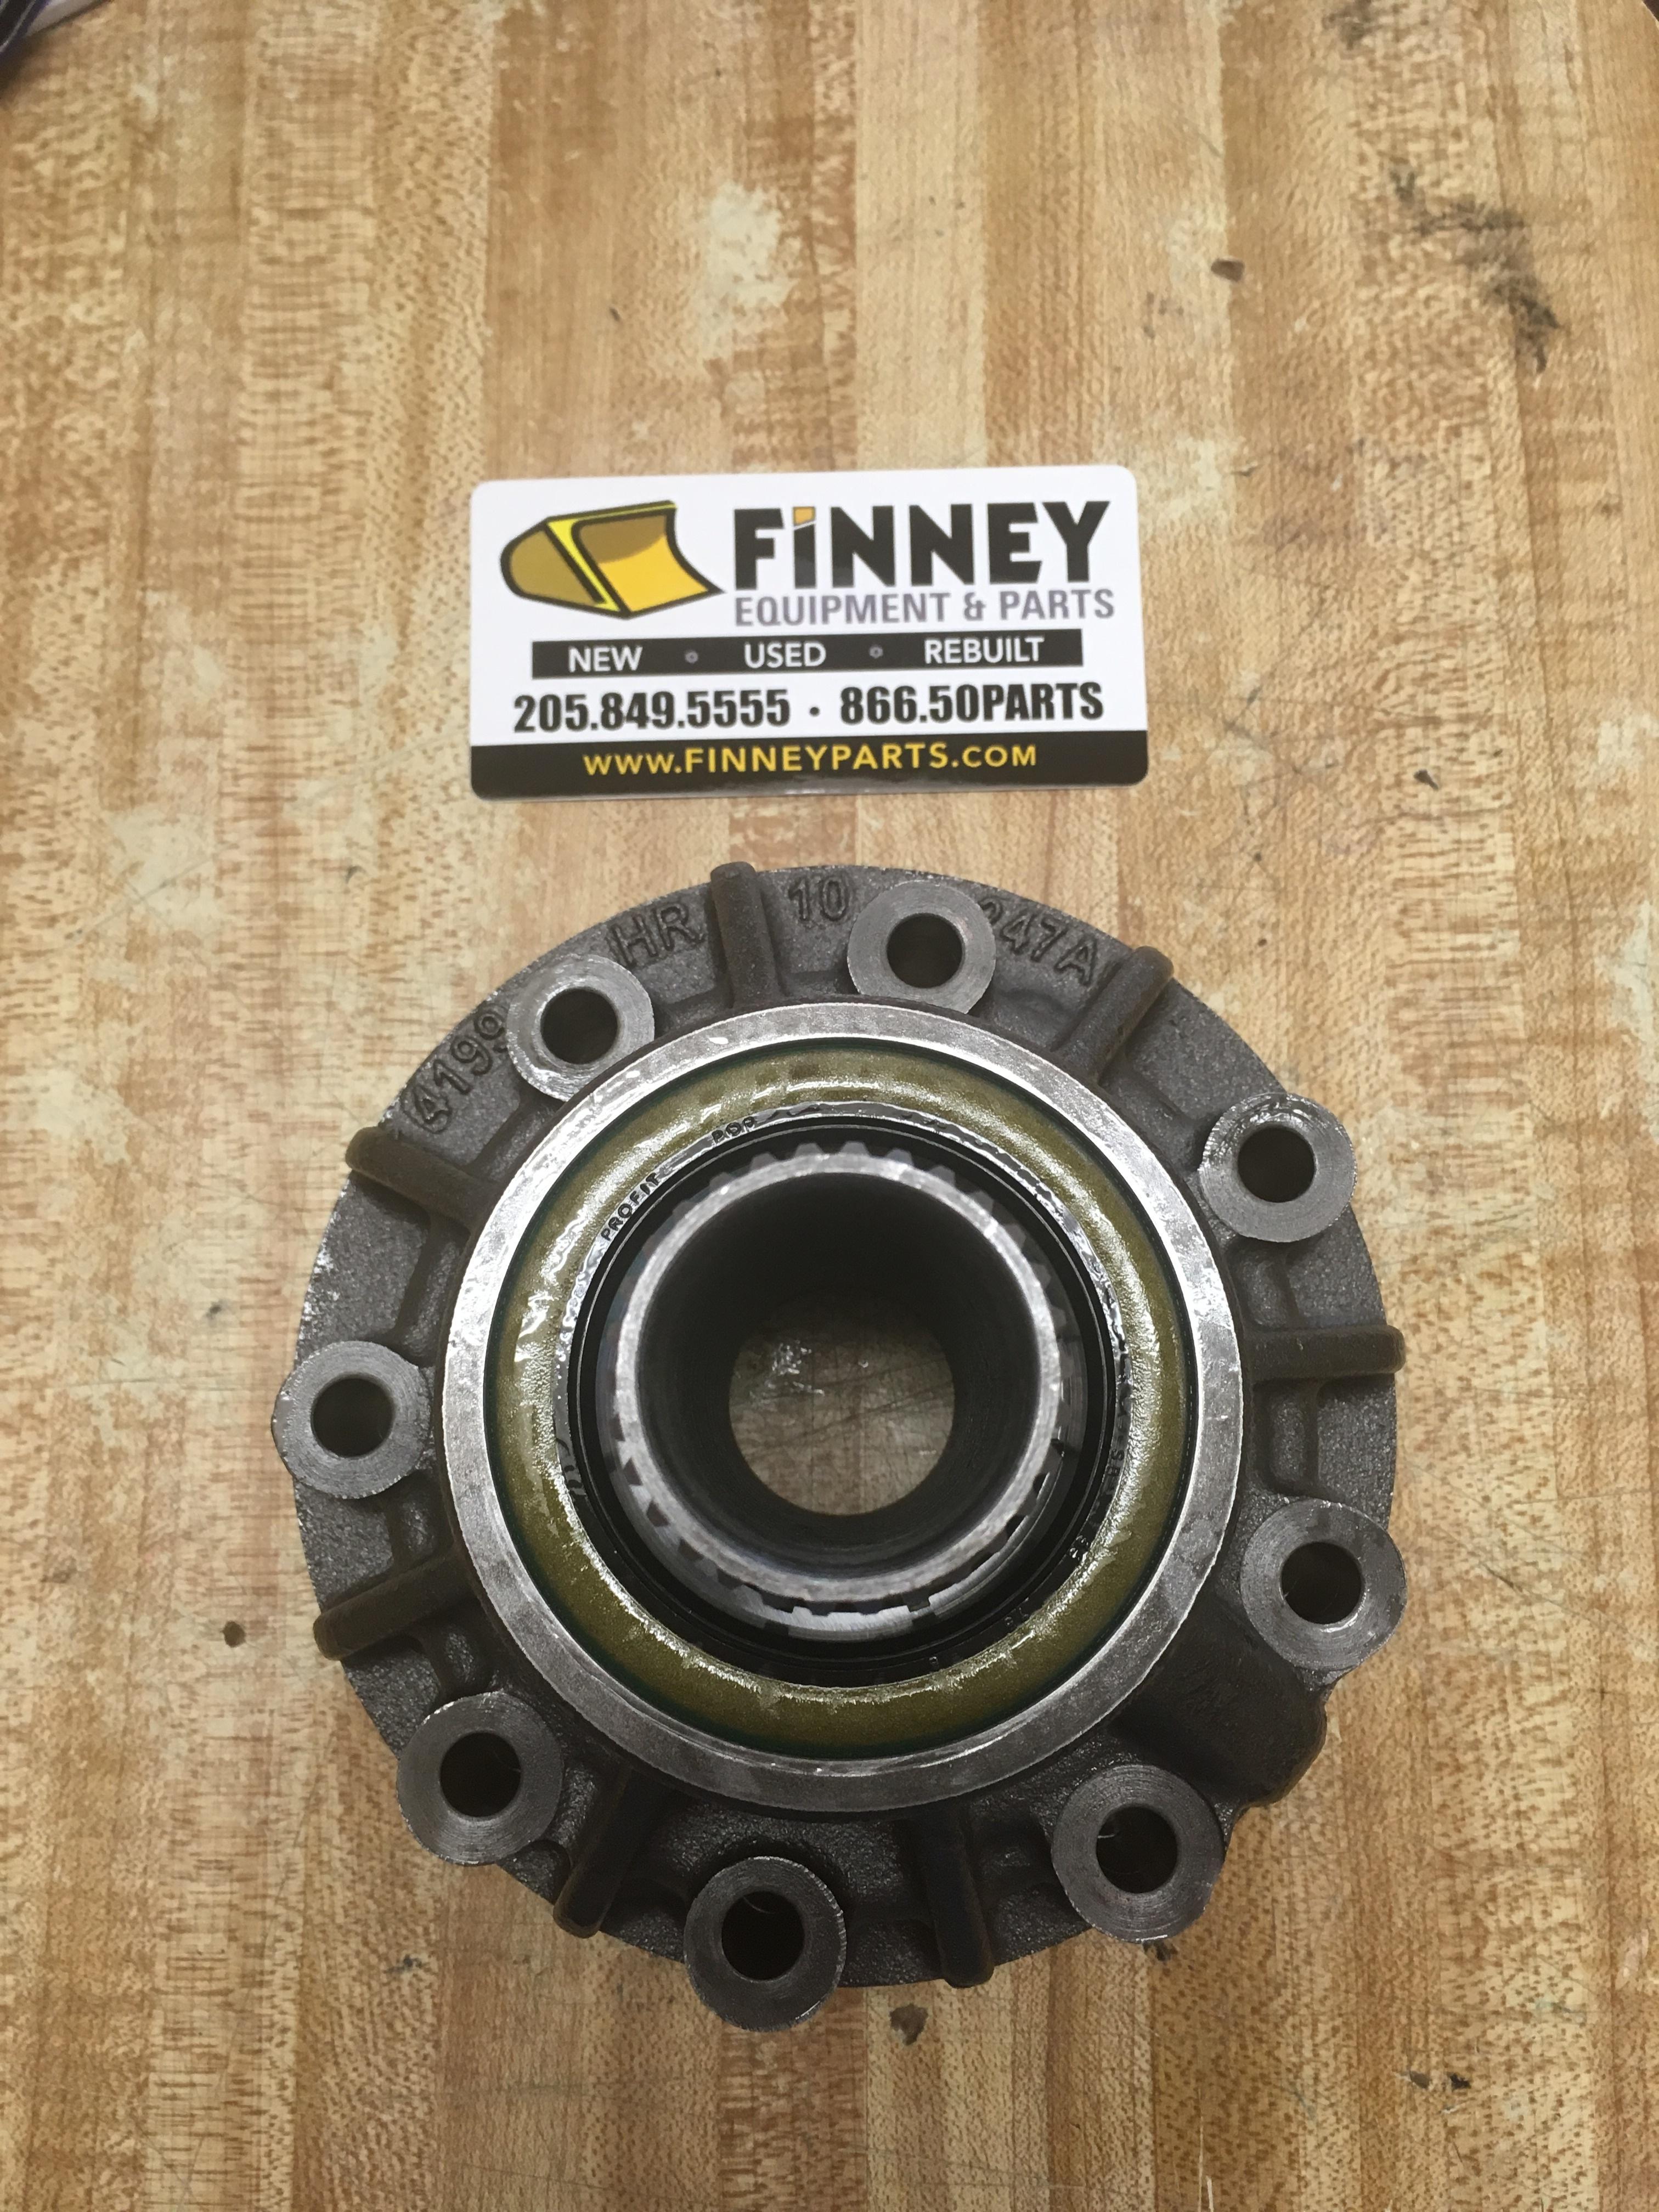 John Deere Backhoe Torque Transmission Pump AT440858 310J 310K 315SJ 325J  AND MORE | Finney Equipment and Parts